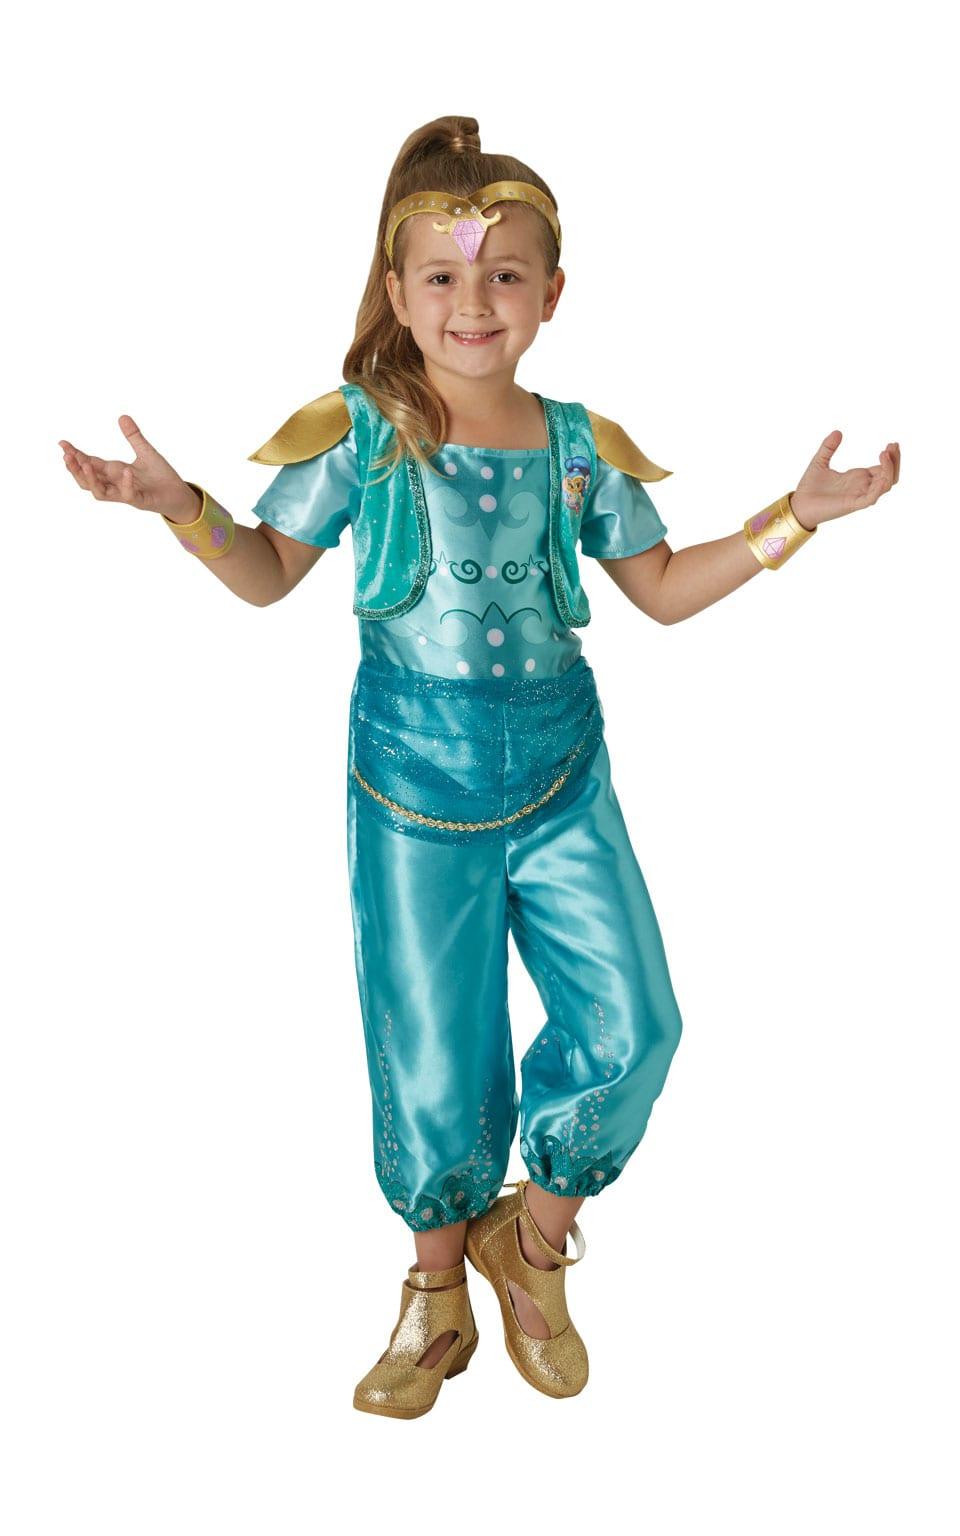 Shine Children's Fancy Dress Costume